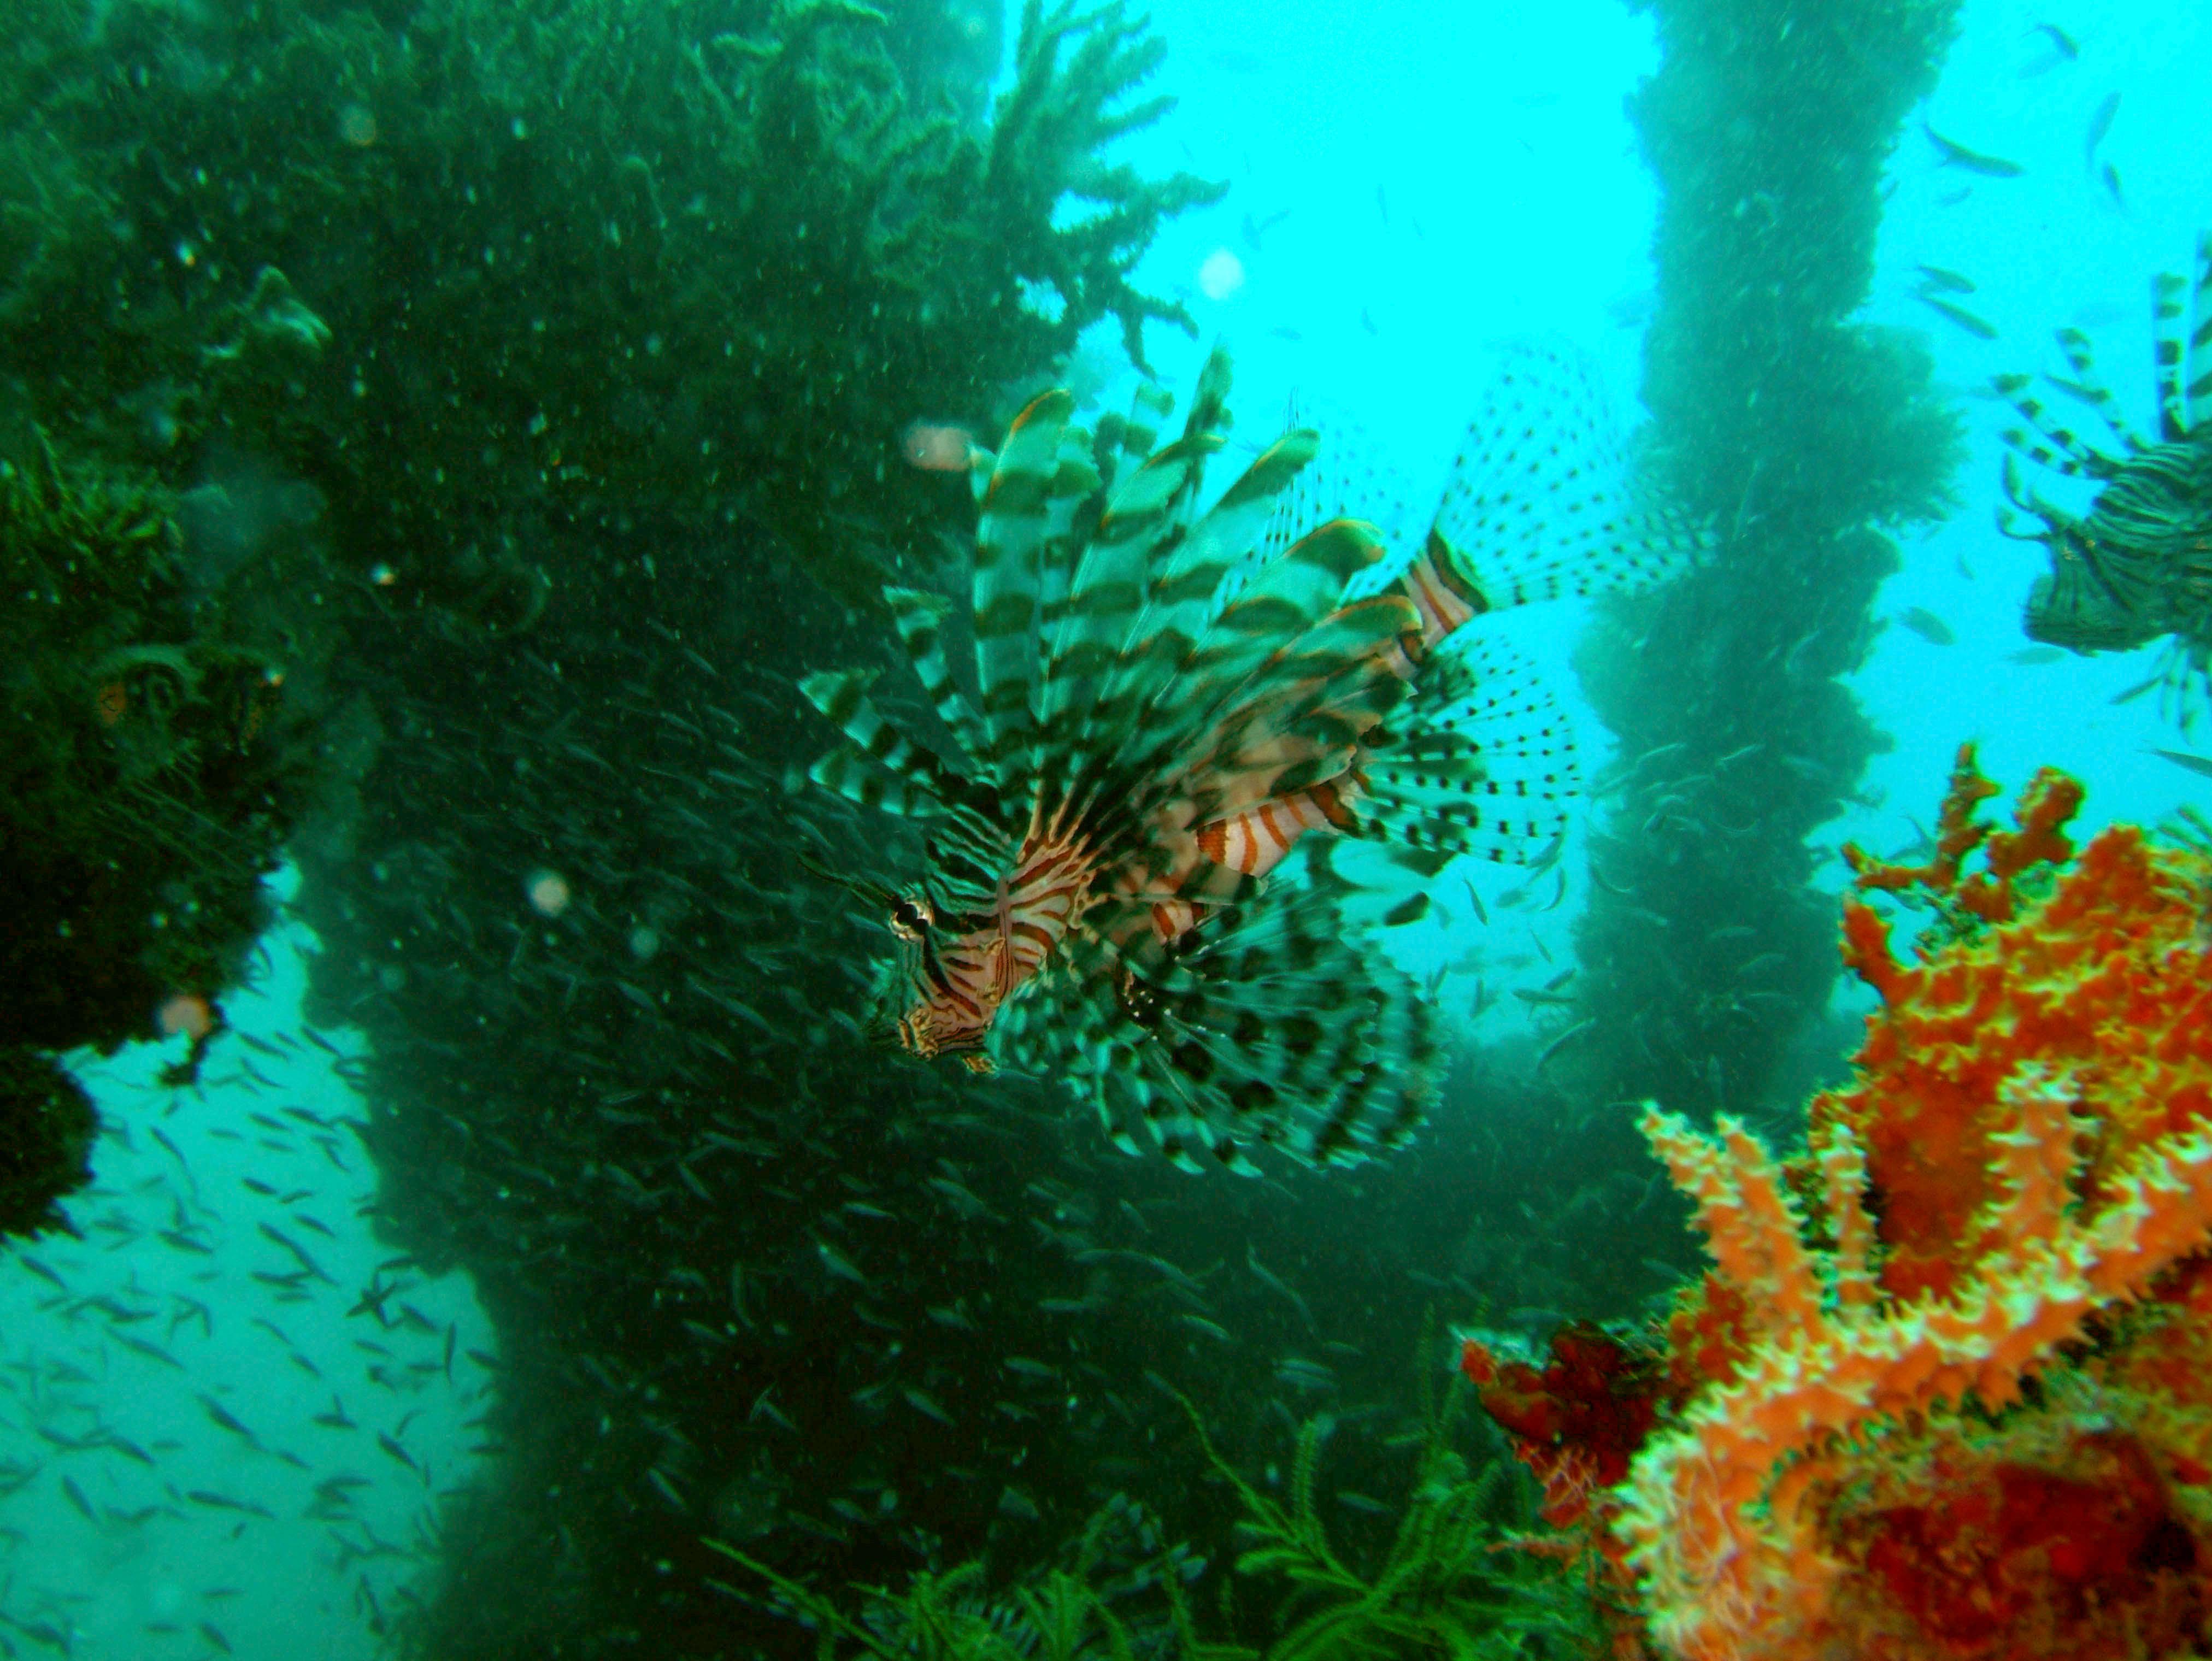 Coron dive site 2 Wreck dive IJN Taiei Maru July 2005 16